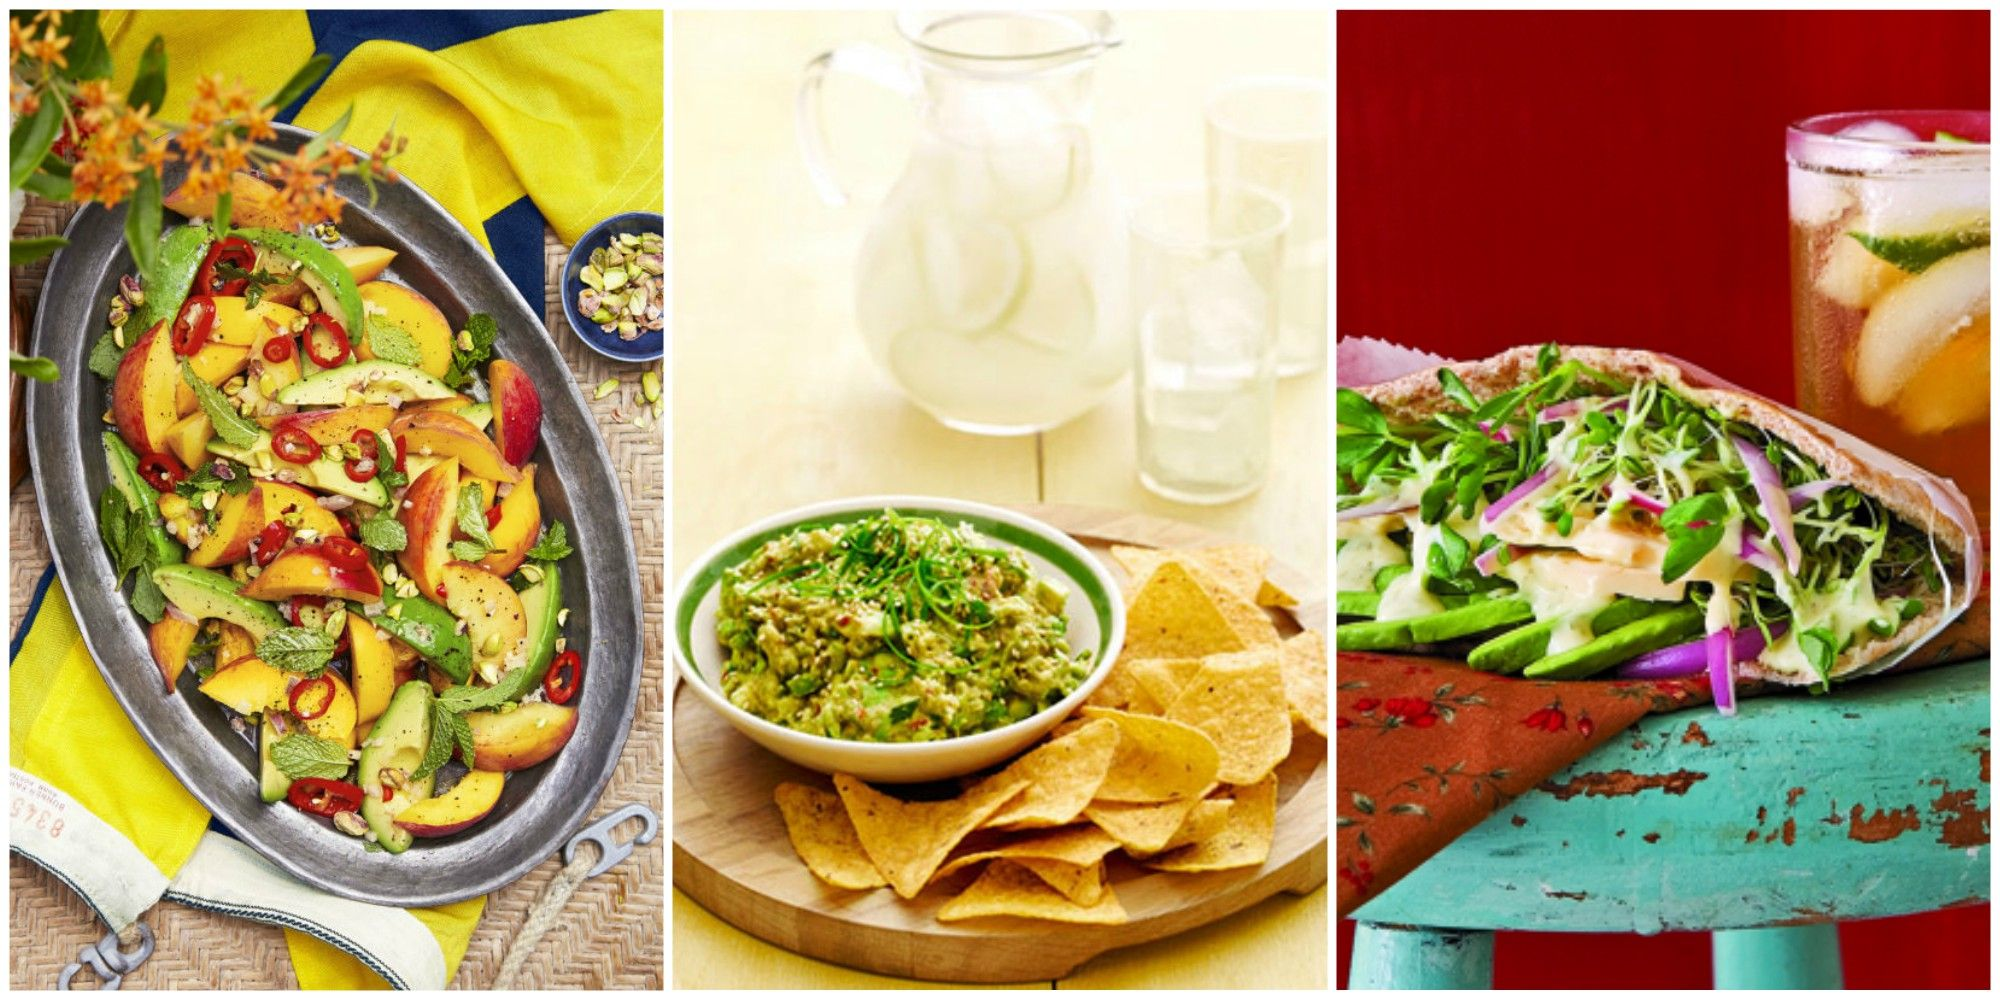 Avocado Recipes - Easy Ways to Cook with Avocados